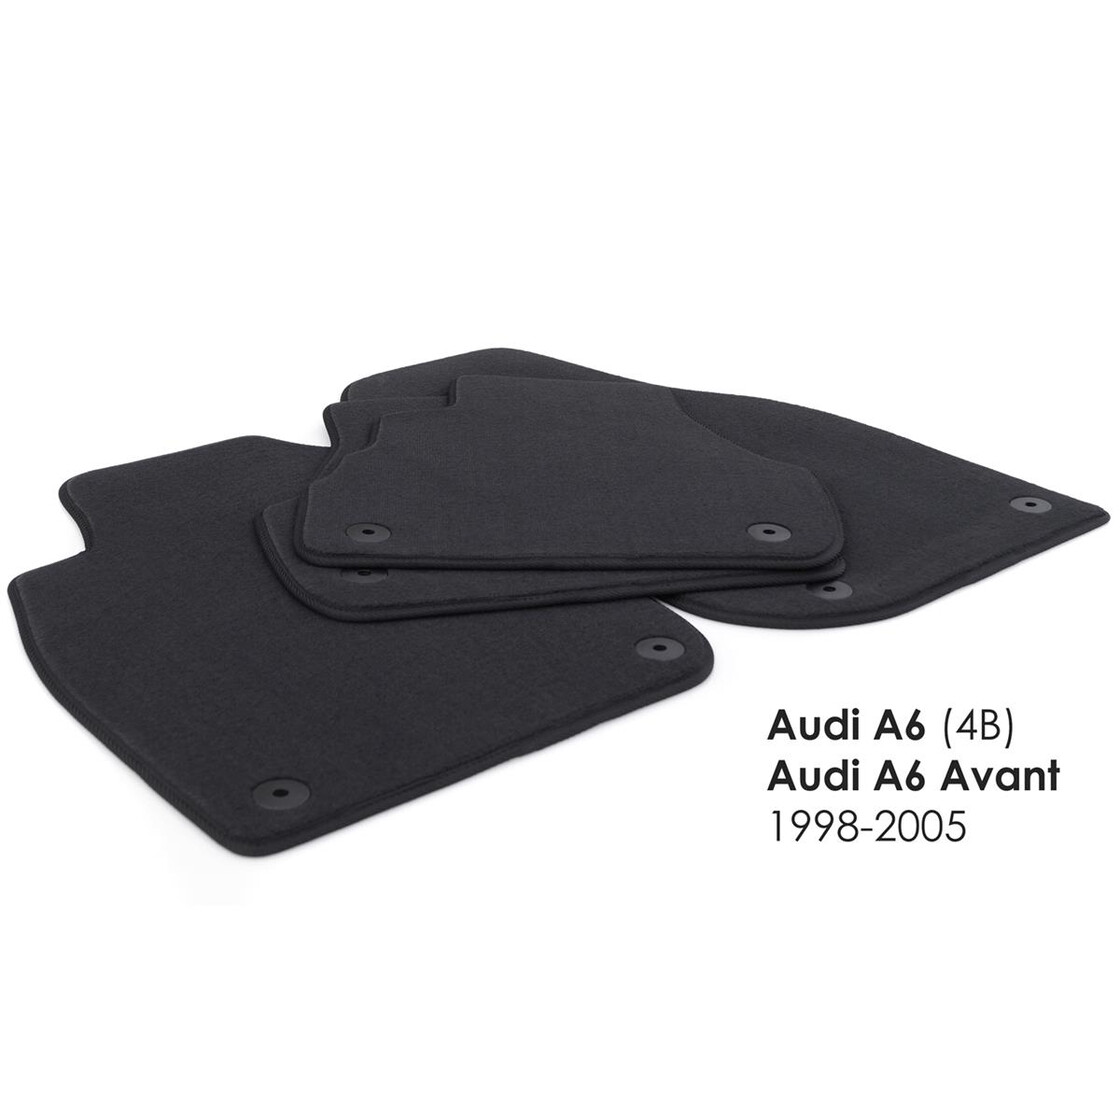 Auto Gummi Fußmatten  AUDI A6  Set 4 teilig Schwarz Art.3